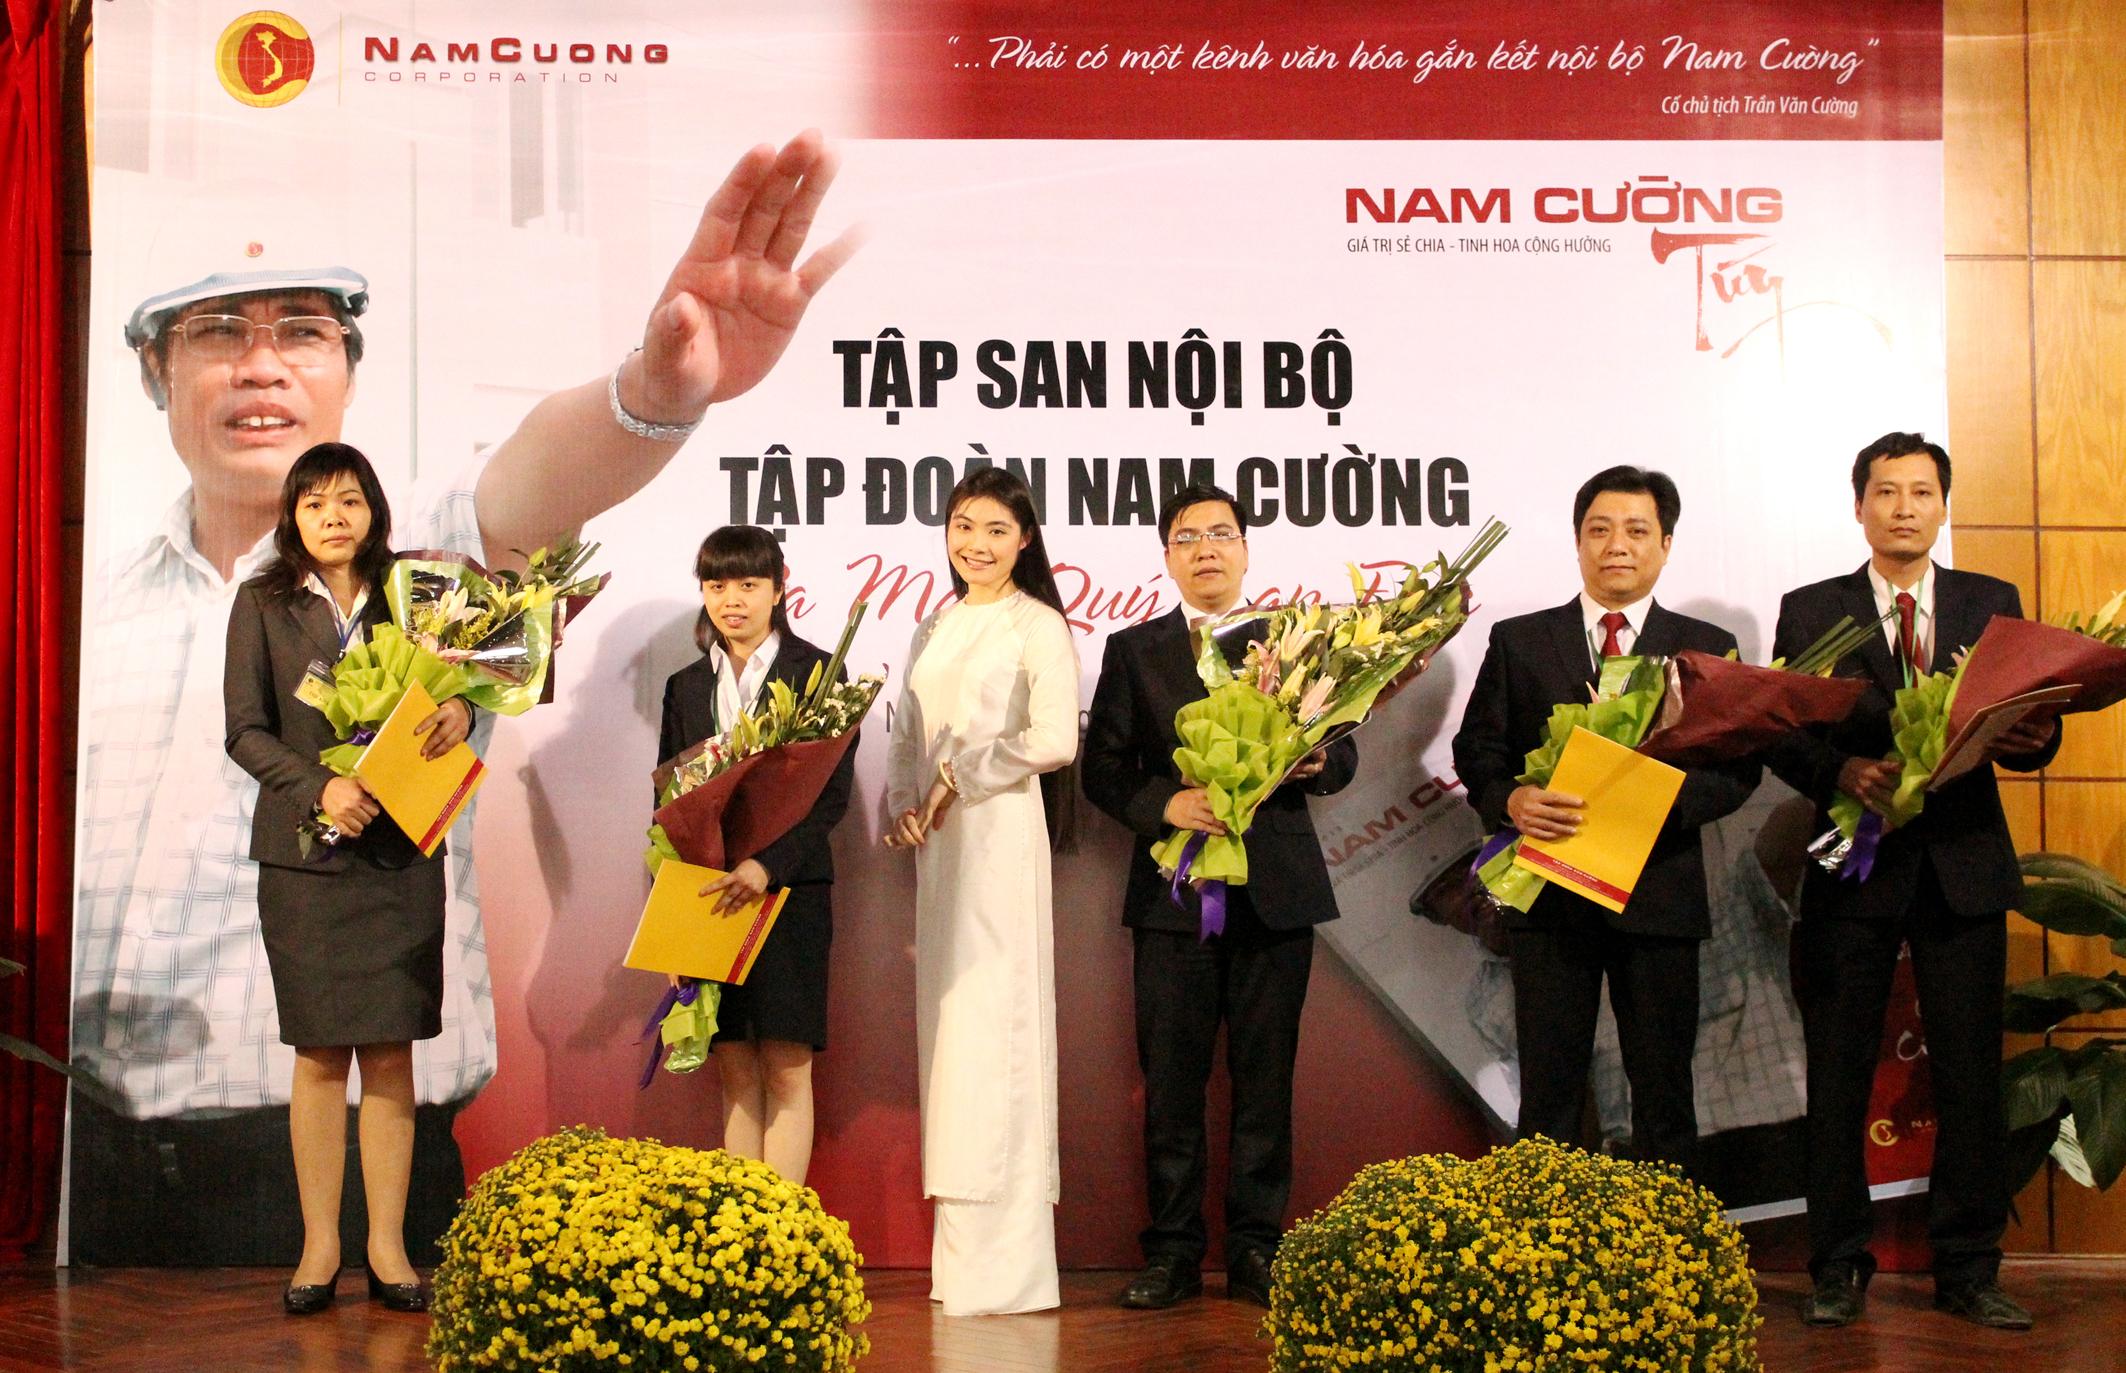 Nam Cường Group